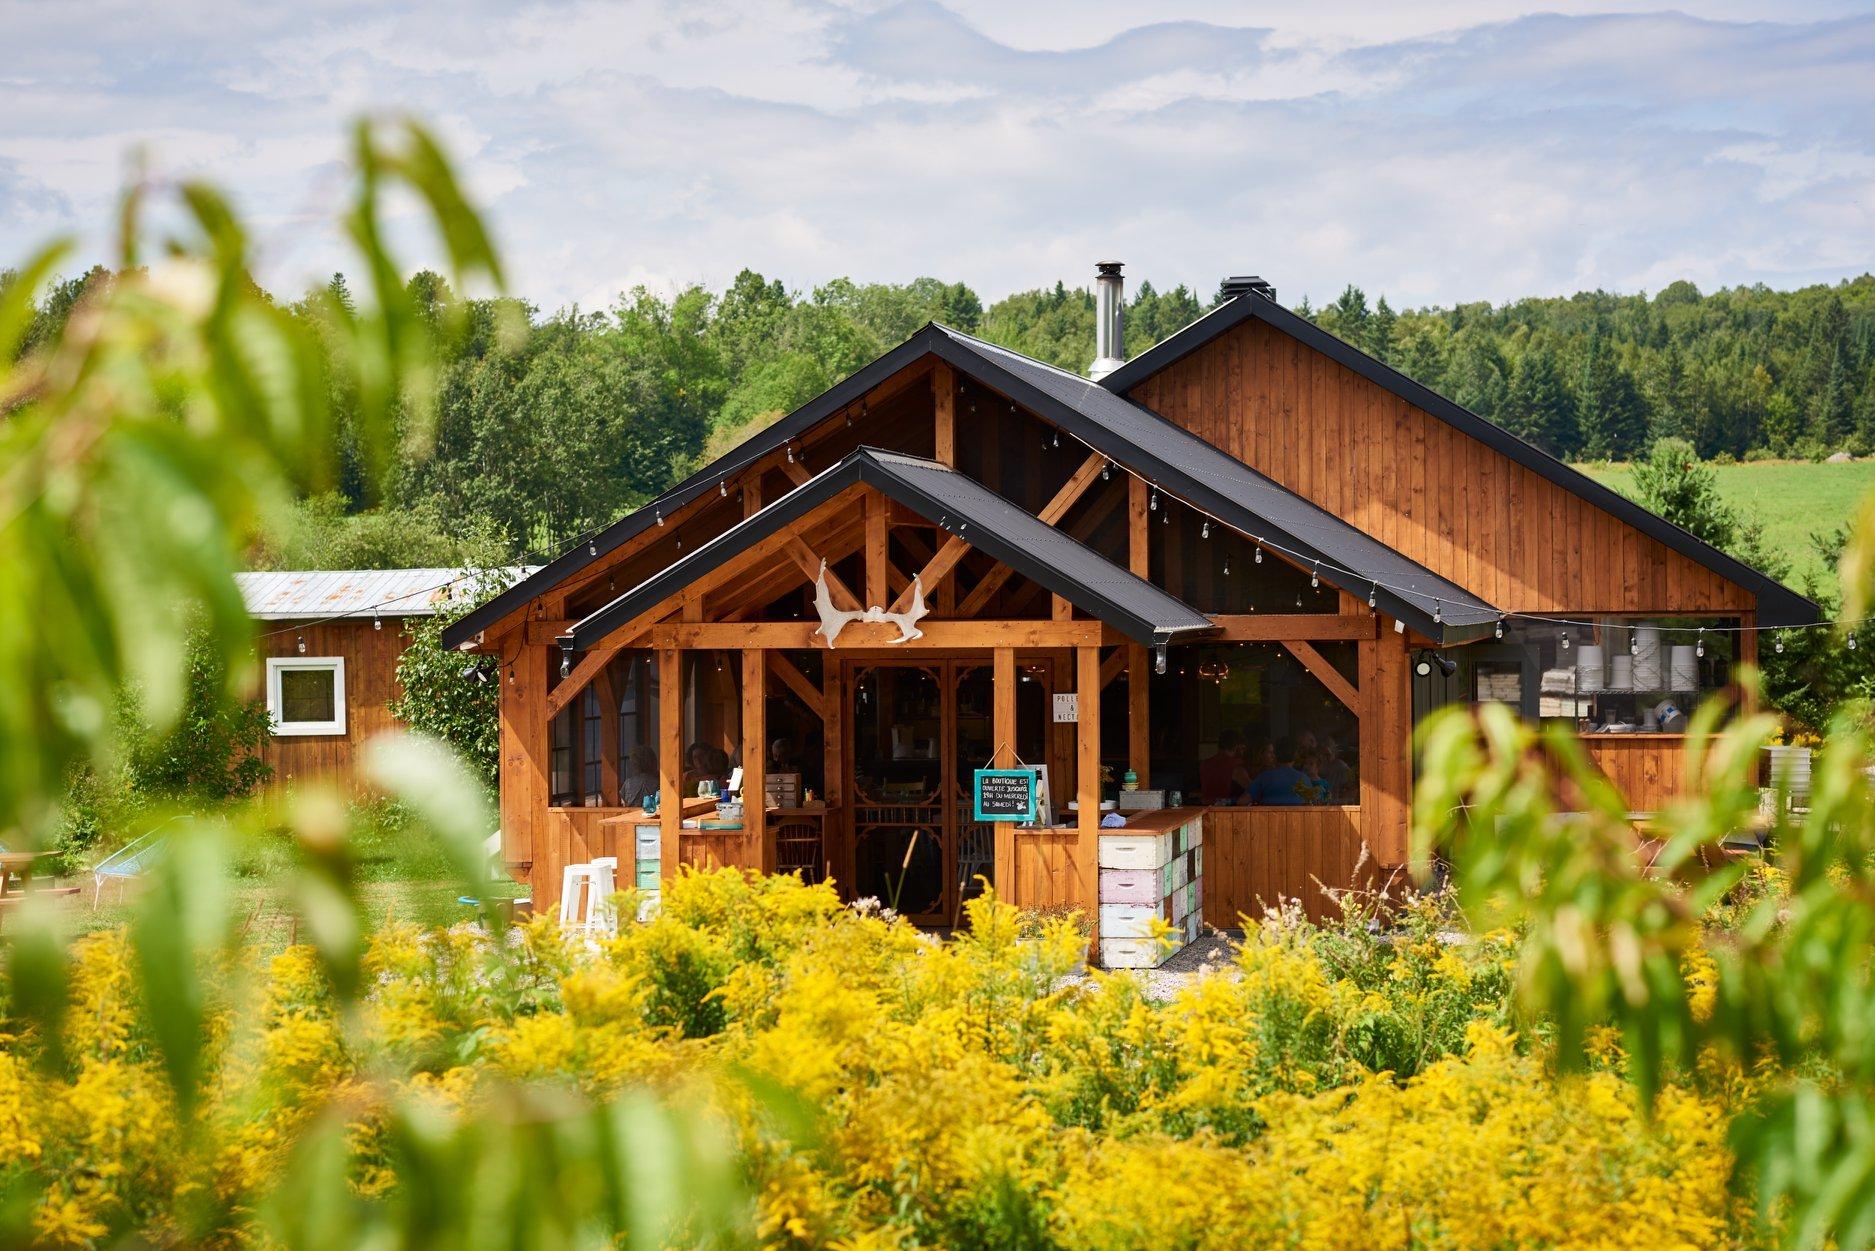 12 Best Farm To Table Restaurants Near Montreal to Eat in Season